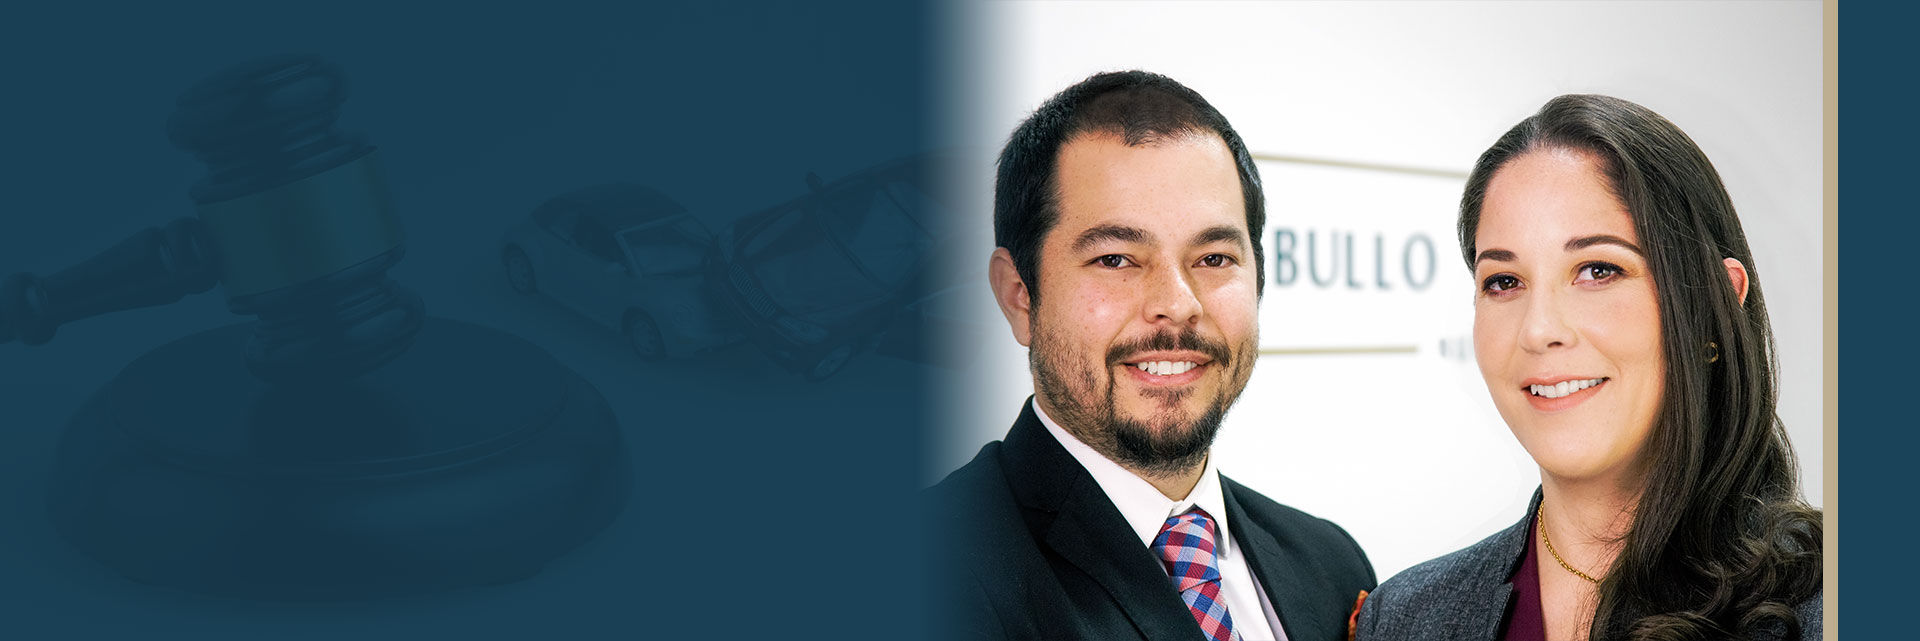 Ingrid y Luigi Slider Bullo Rodriguez Bureau Legal advice and insurance